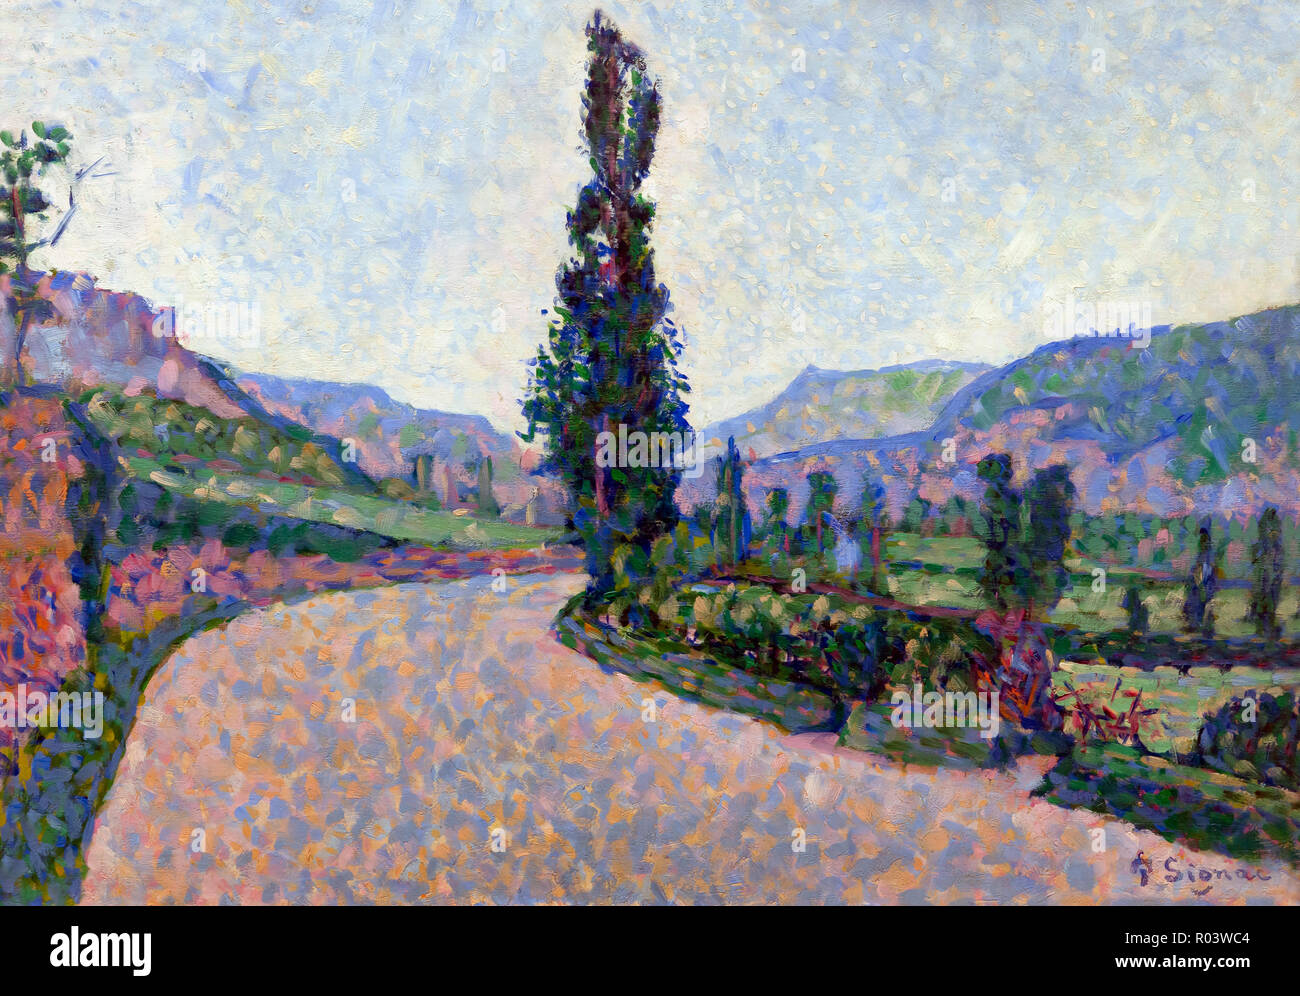 Comblat-le-Chateau, The Poplar, Paul Signac, 1887, Zurich Kunsthaus, Zurich, Switzerland, Europe Stock Photo